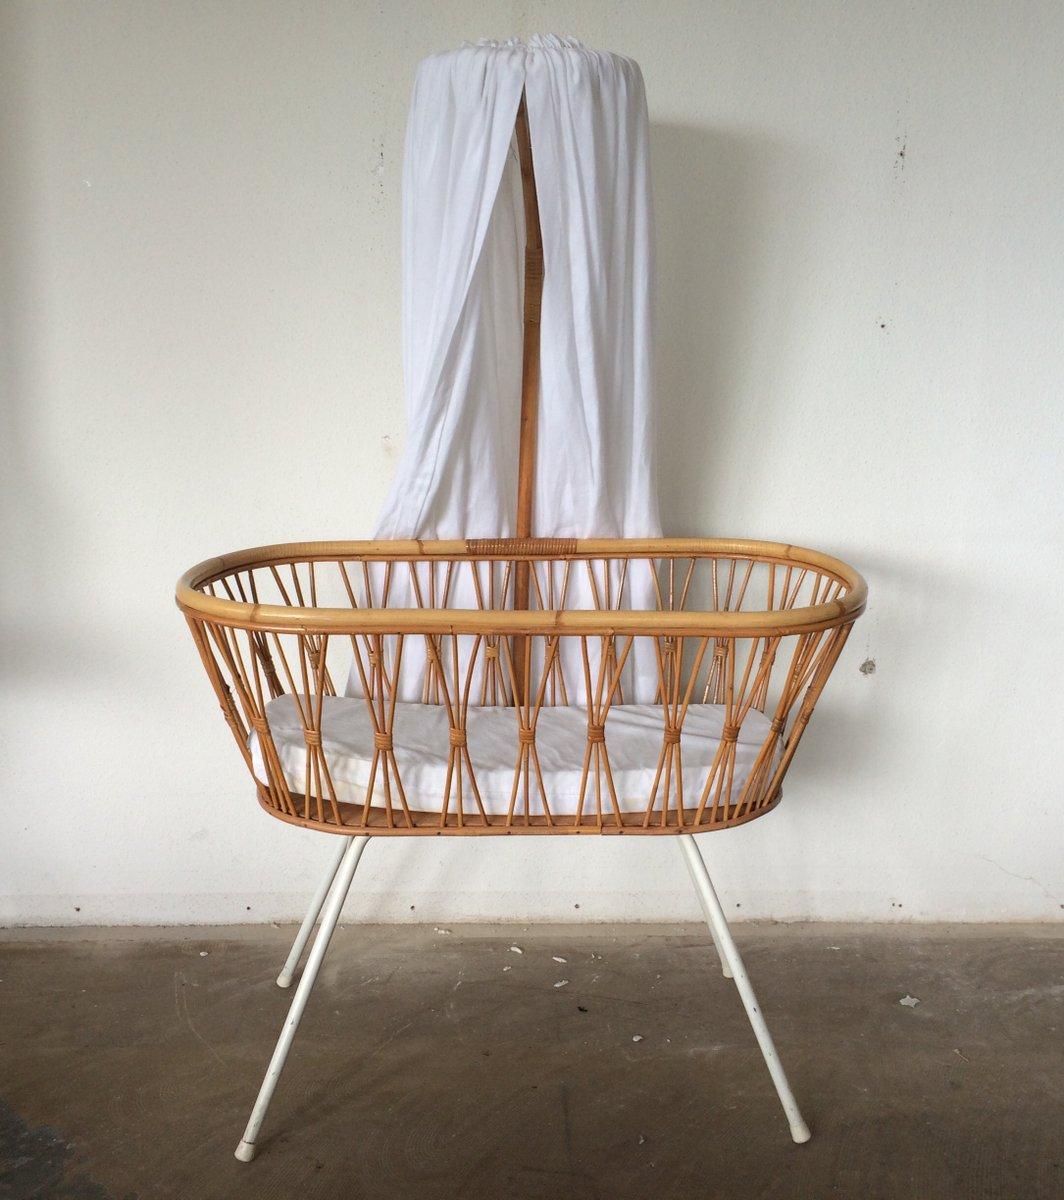 Vintage crib for sale - Vintage Baby Crib From Roh Noordwolde